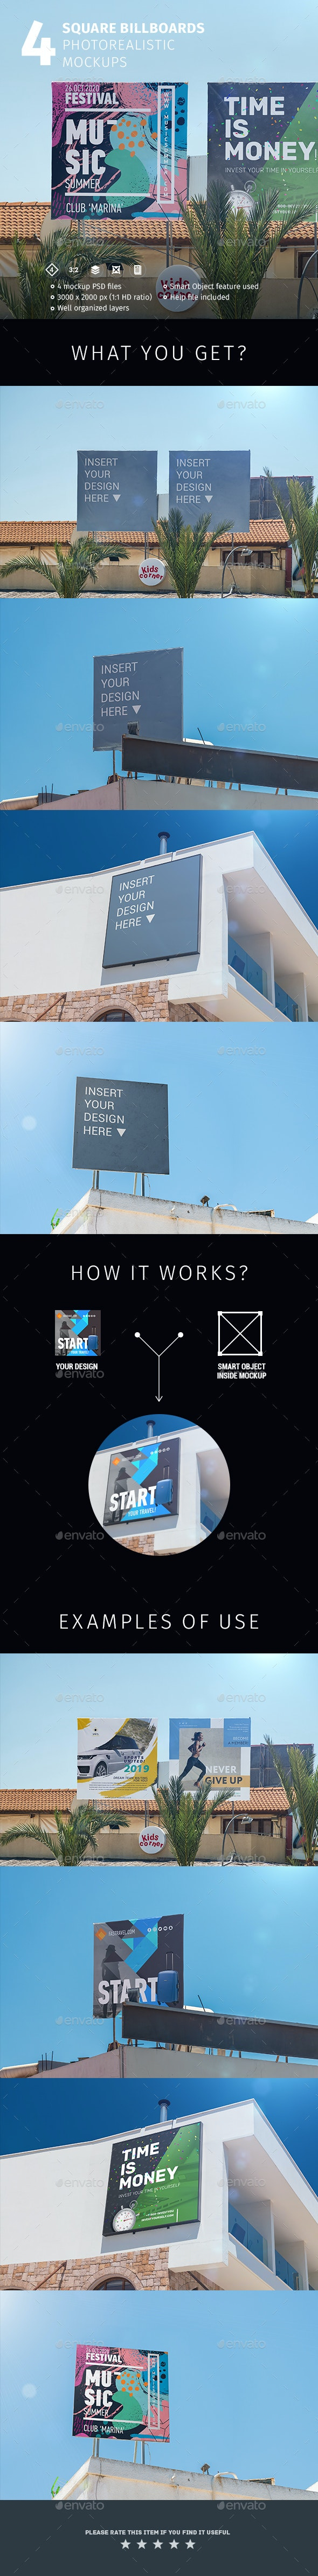 4 Square Billboards Photorealistic Mockups - Signage Print